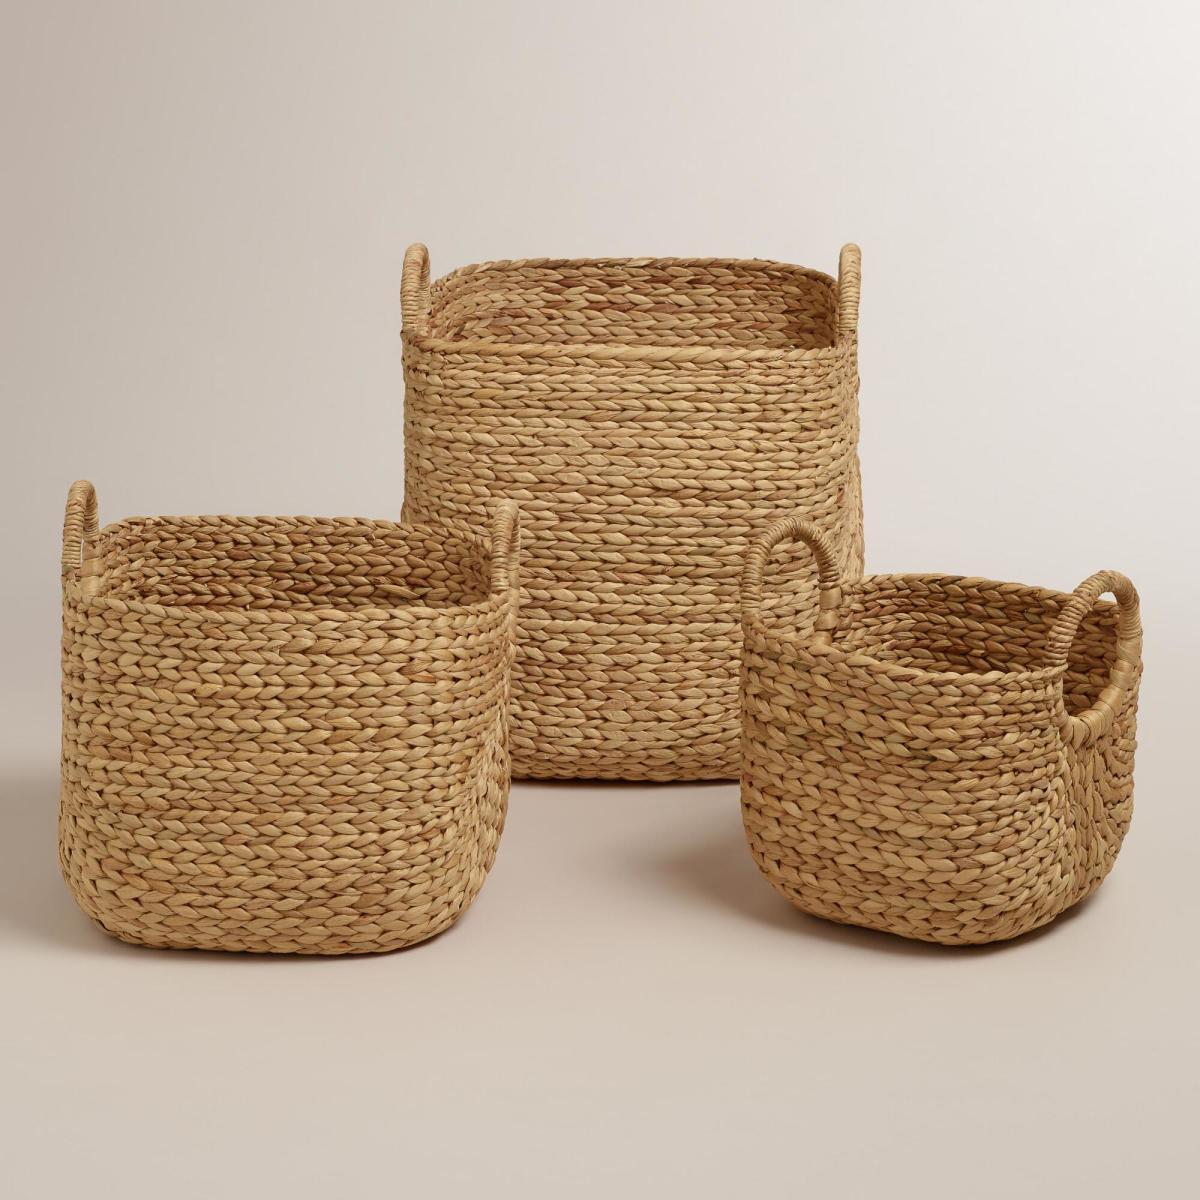 Aimee Arrow Baskets from World Market